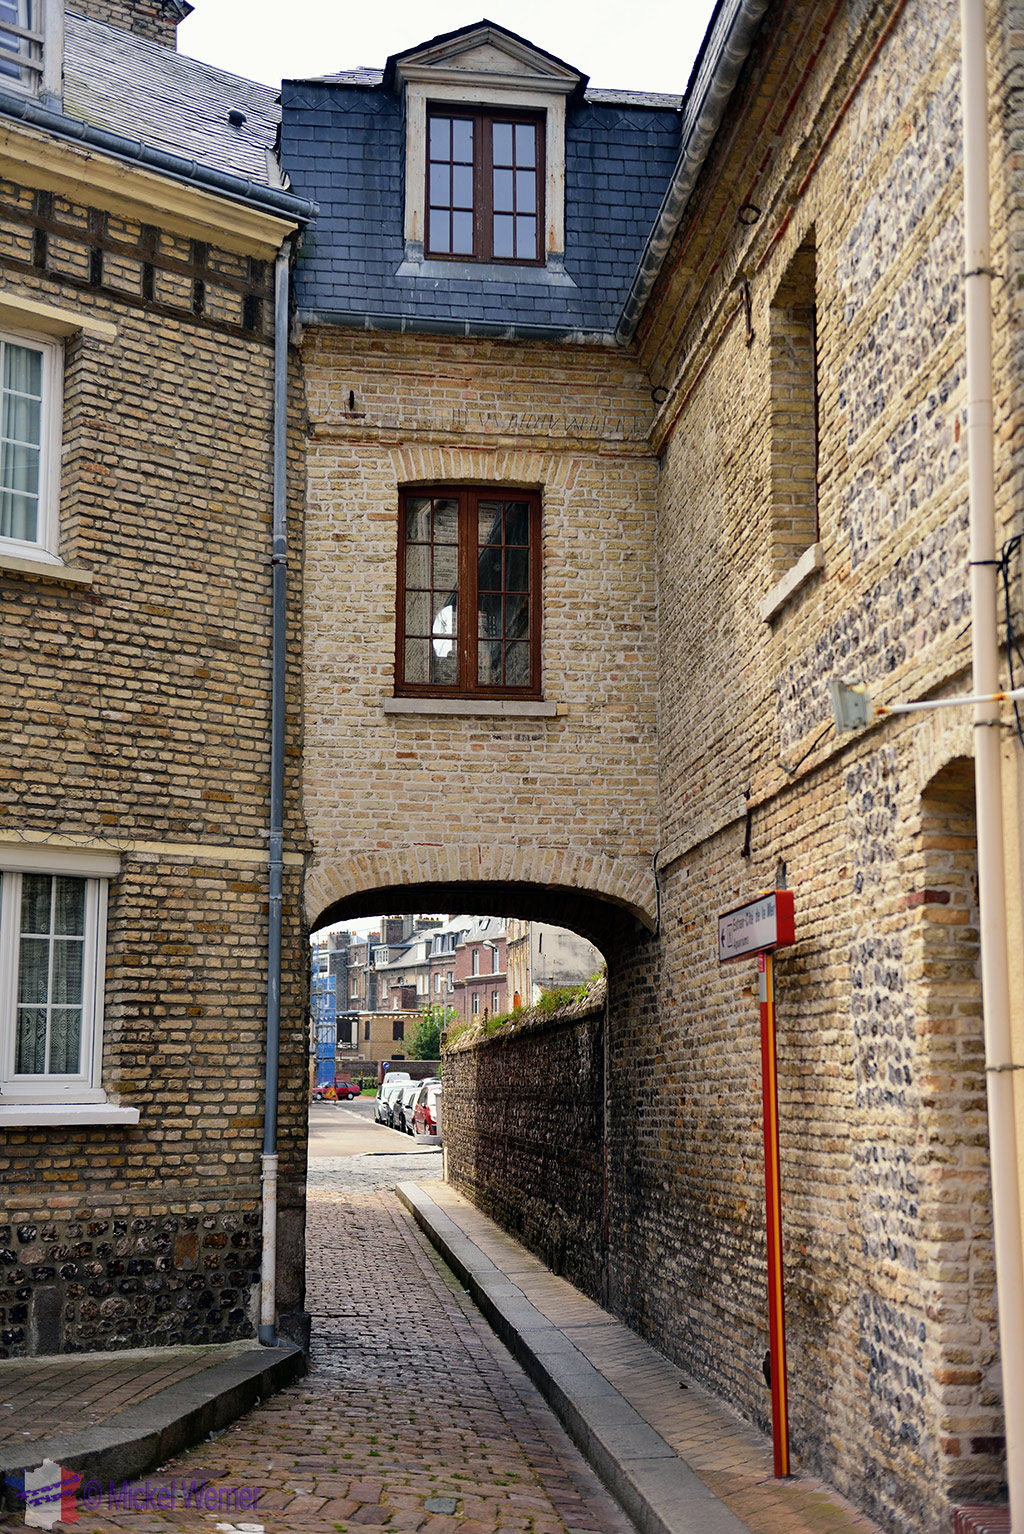 Narrow street of Dieppe